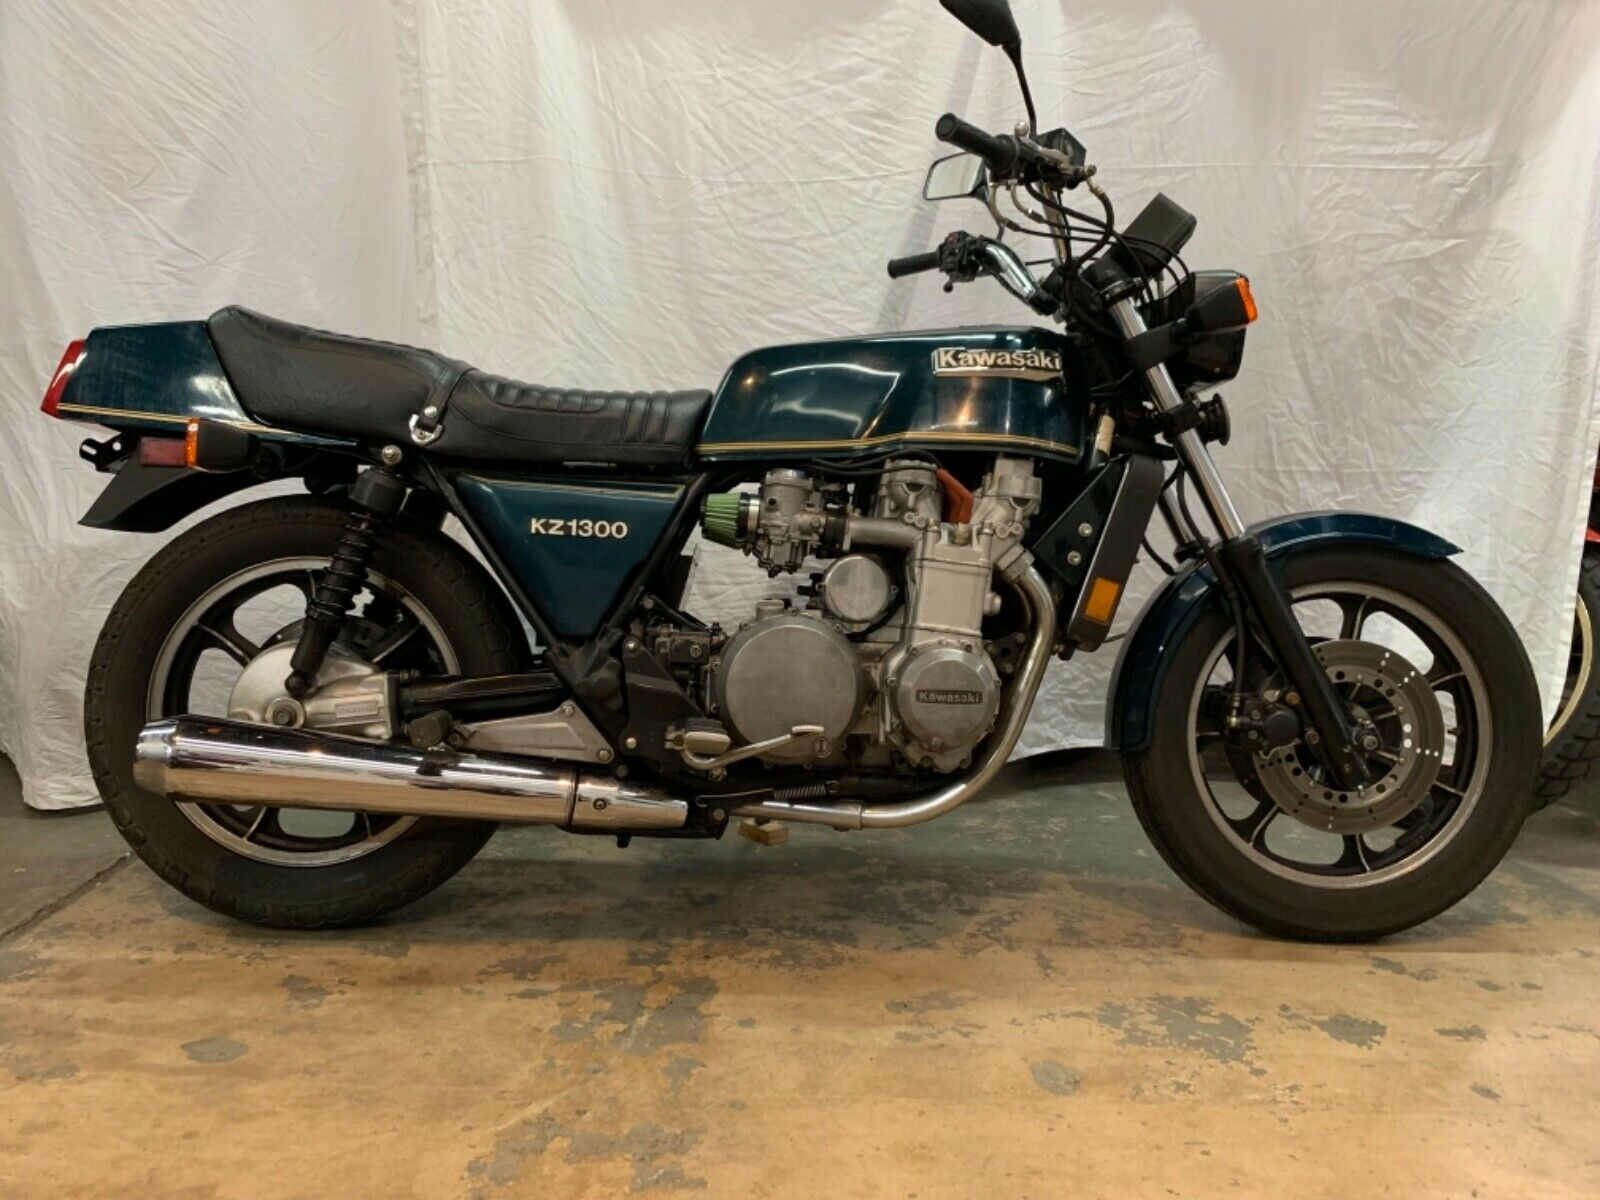 1979 Kawasaki Kz1300 The Other Japanese Six Cylinder Behemoth Adventure Rider